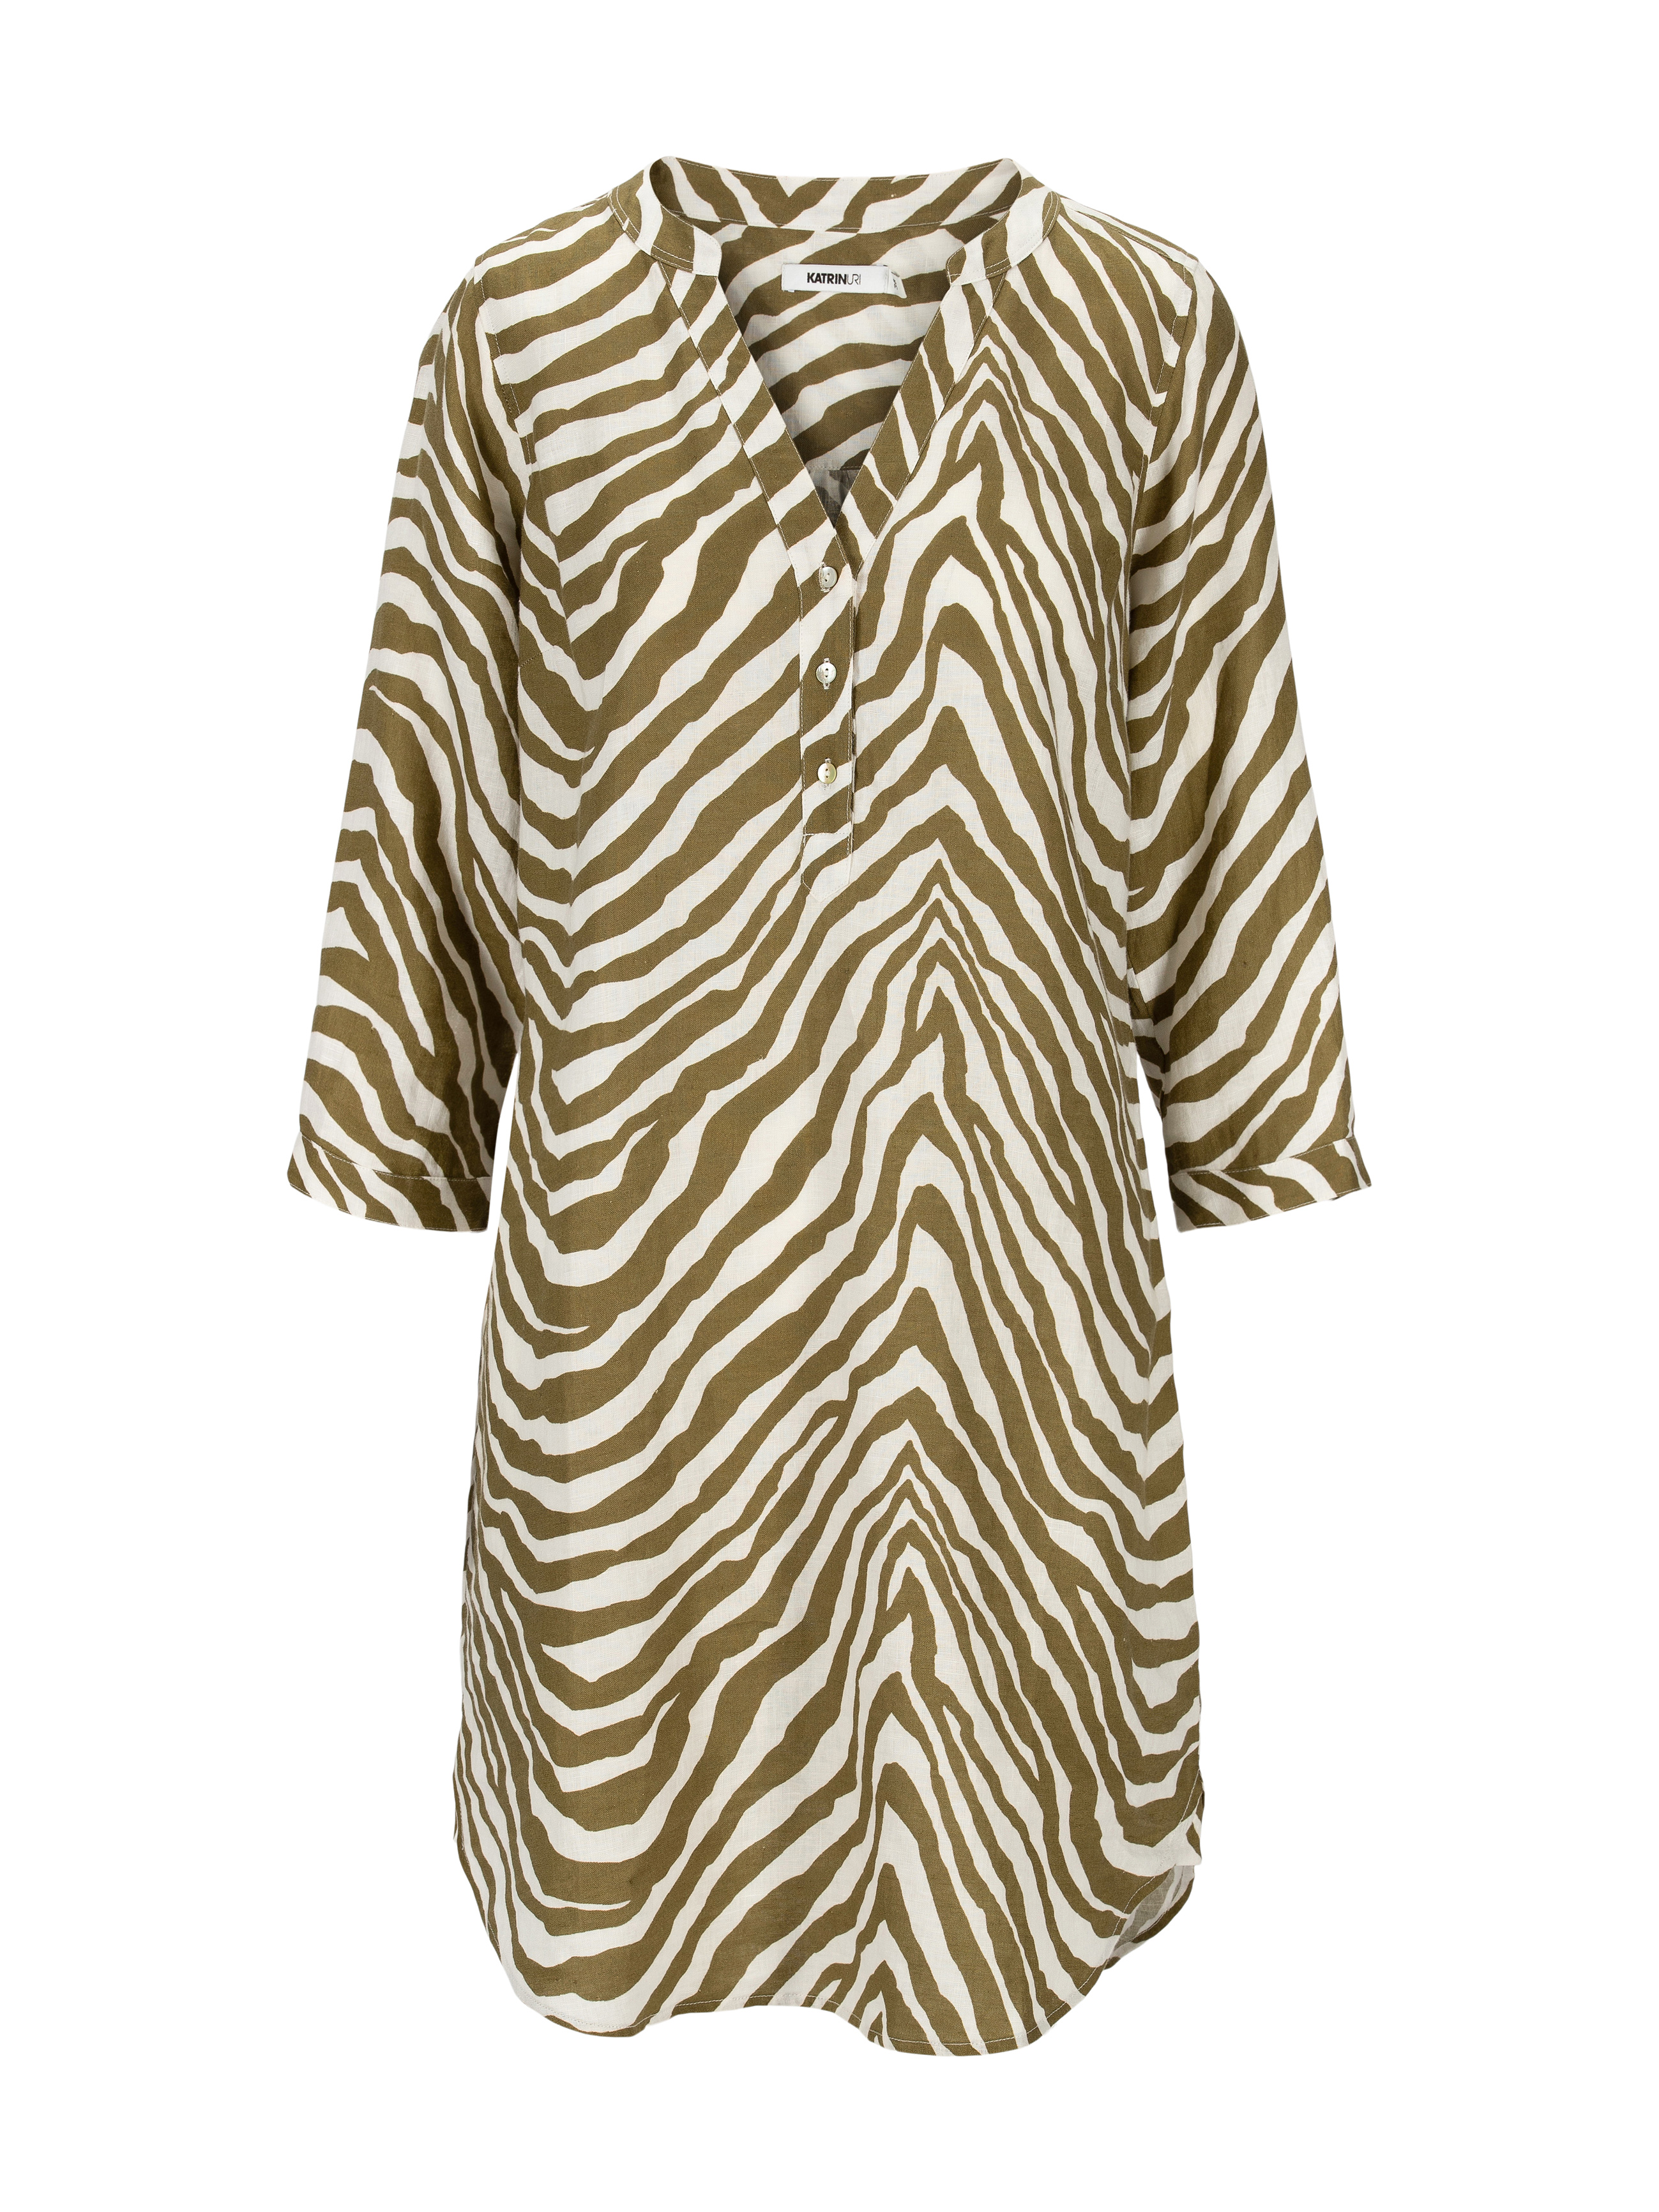 Nairobi aria dress